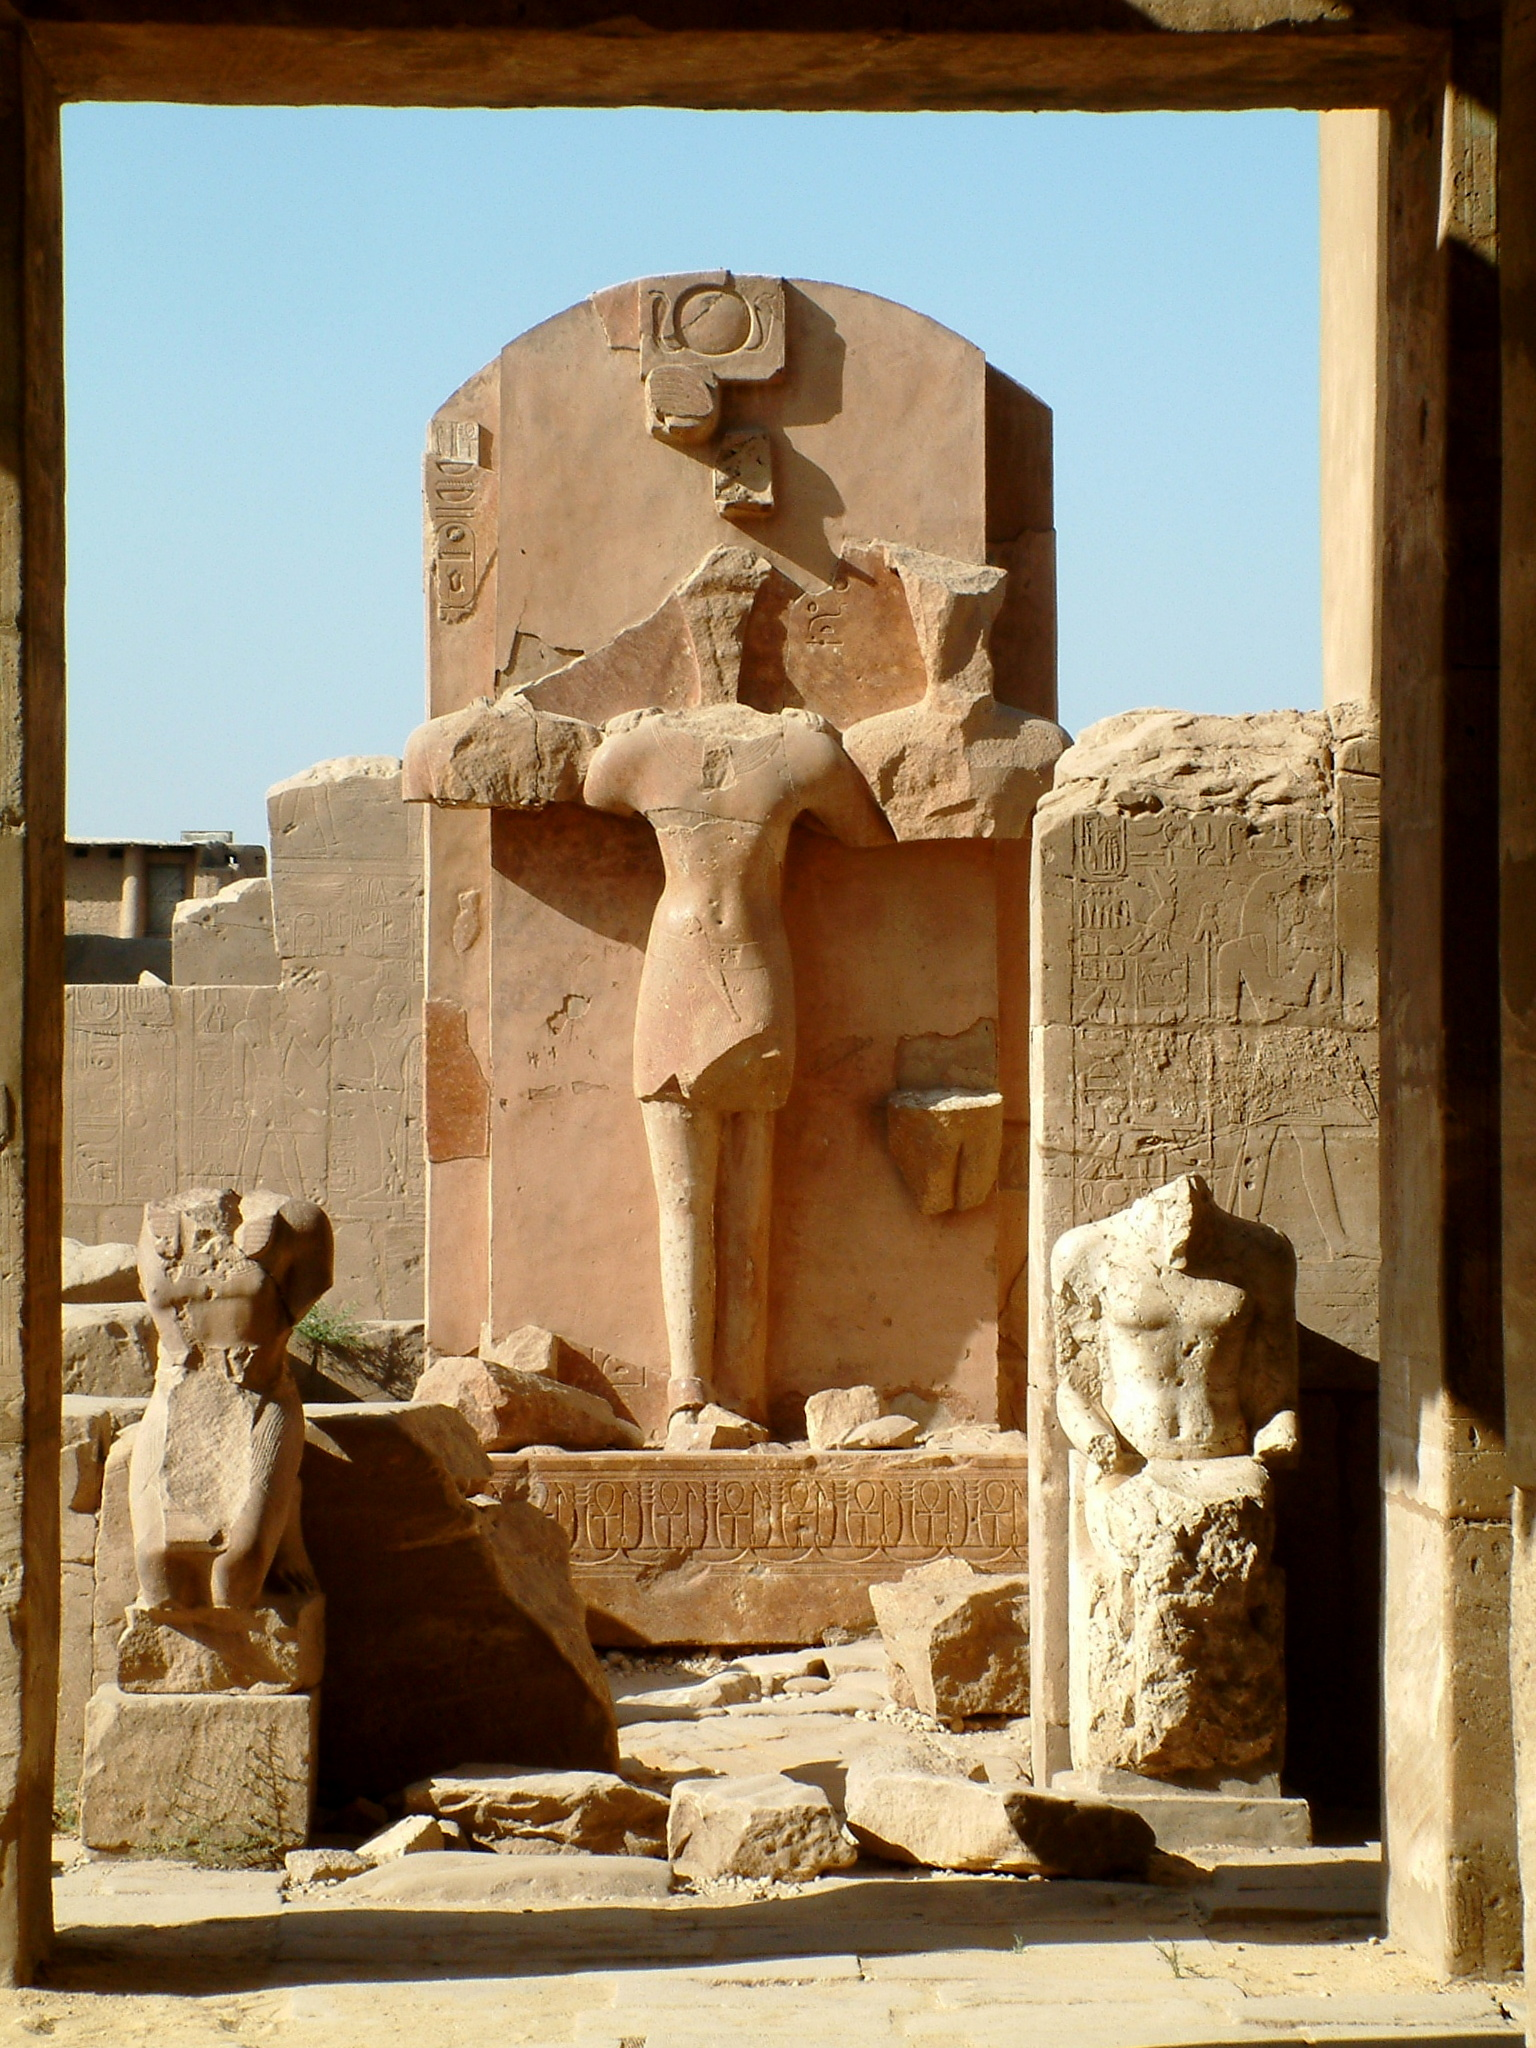 Historic vandalism in Egypt